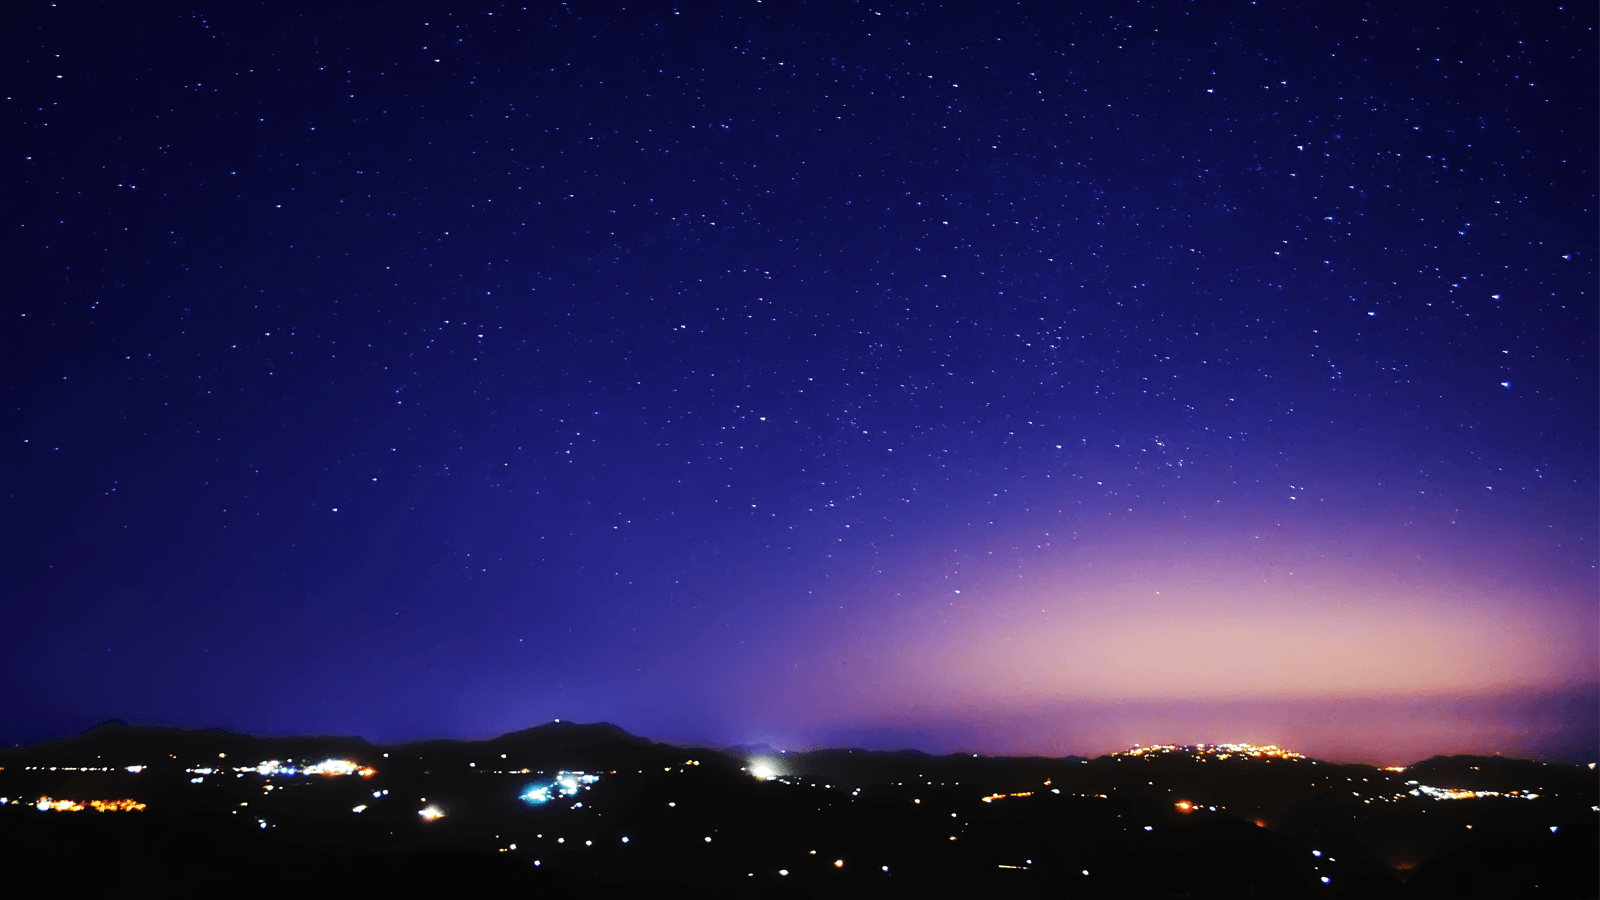 Sky At Night Wallpapers - Wallpaper Cave